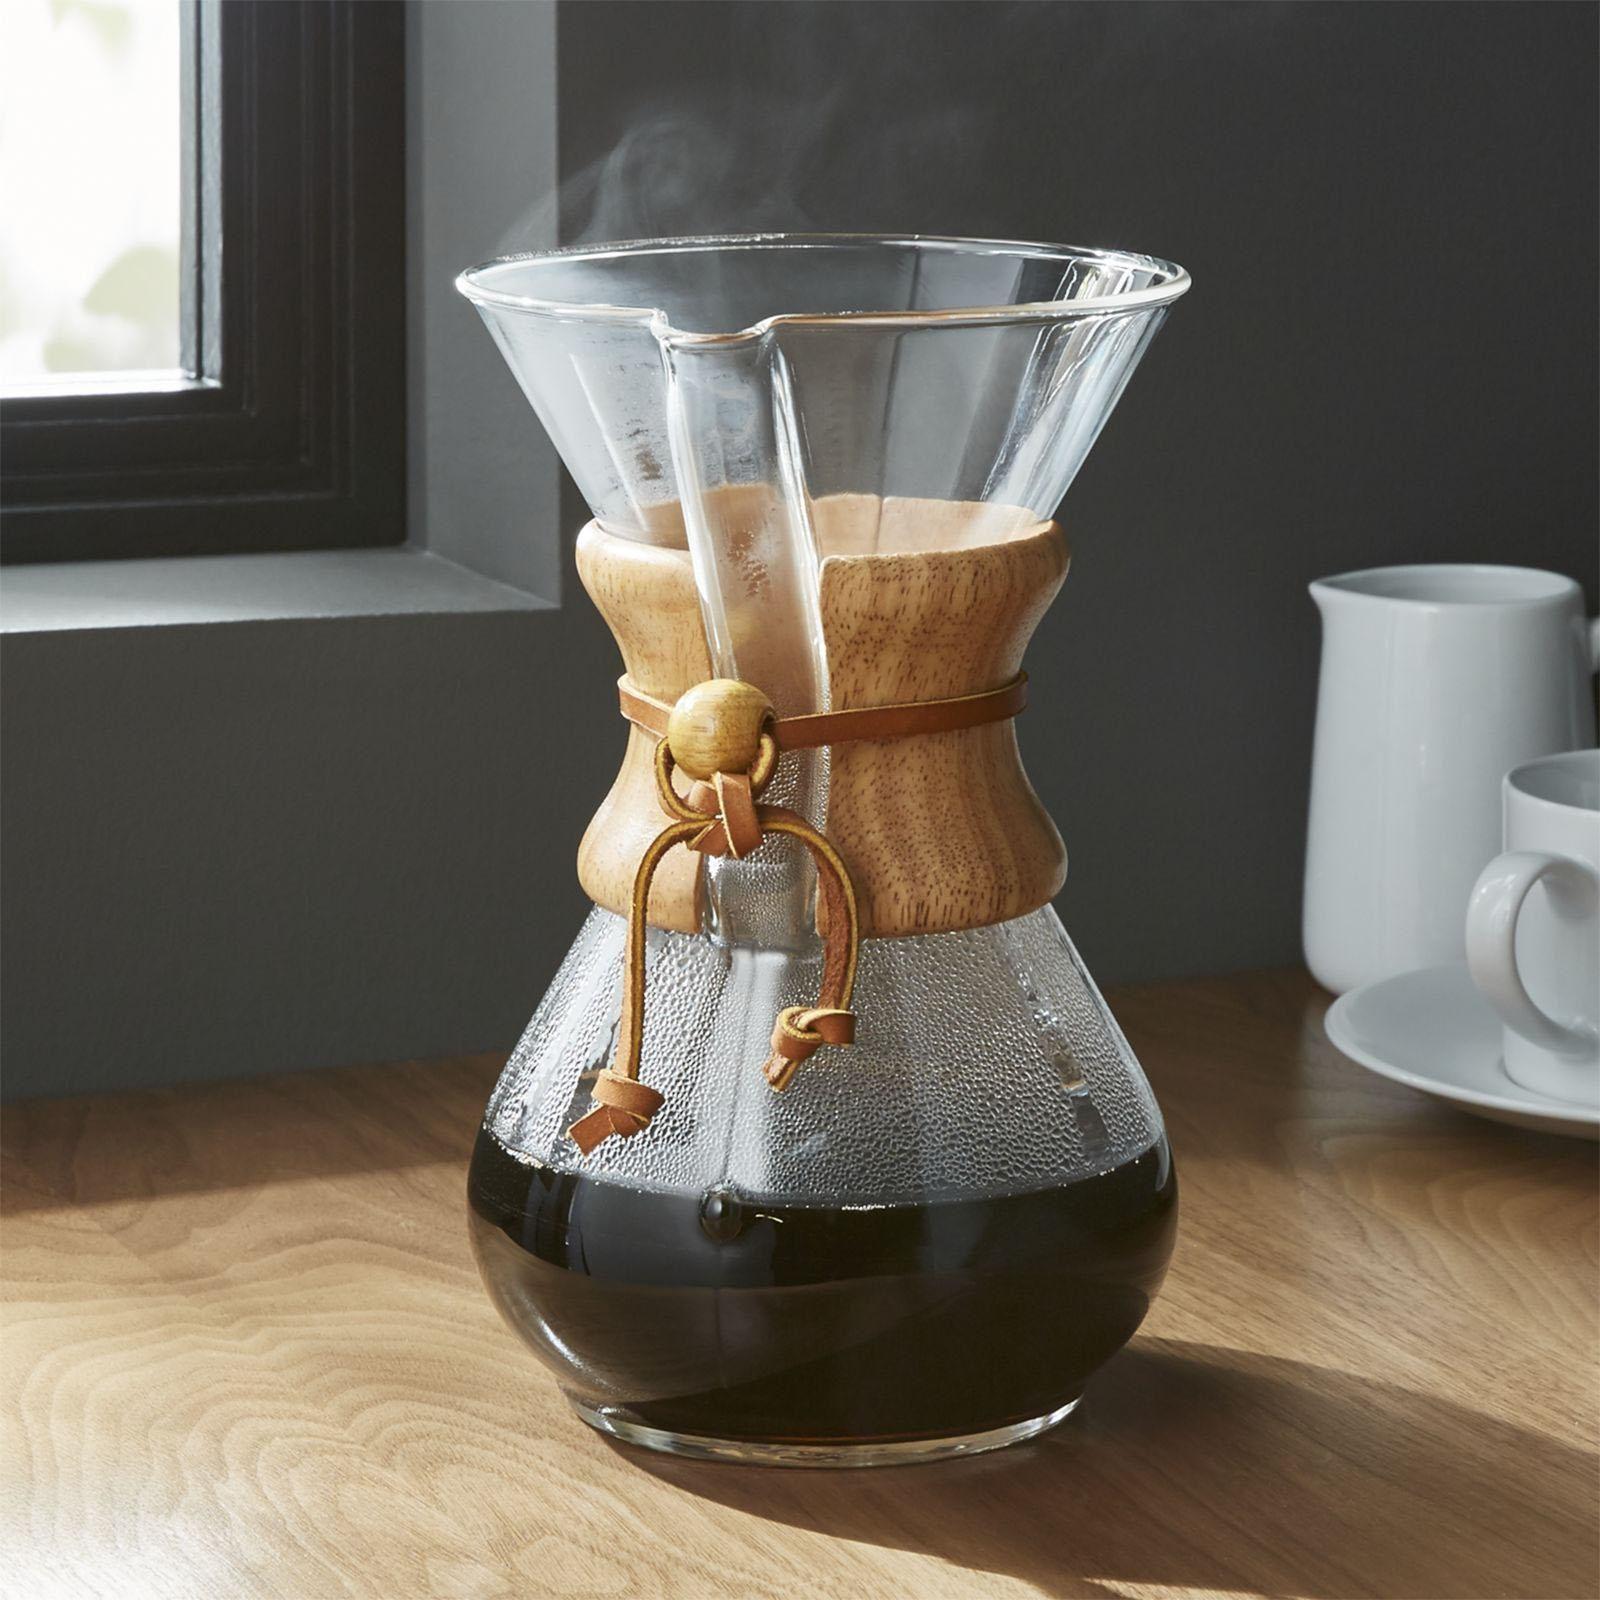 CHEMEX Coffeemaker by Dr. Peter Schlumbohm, 1941 Café